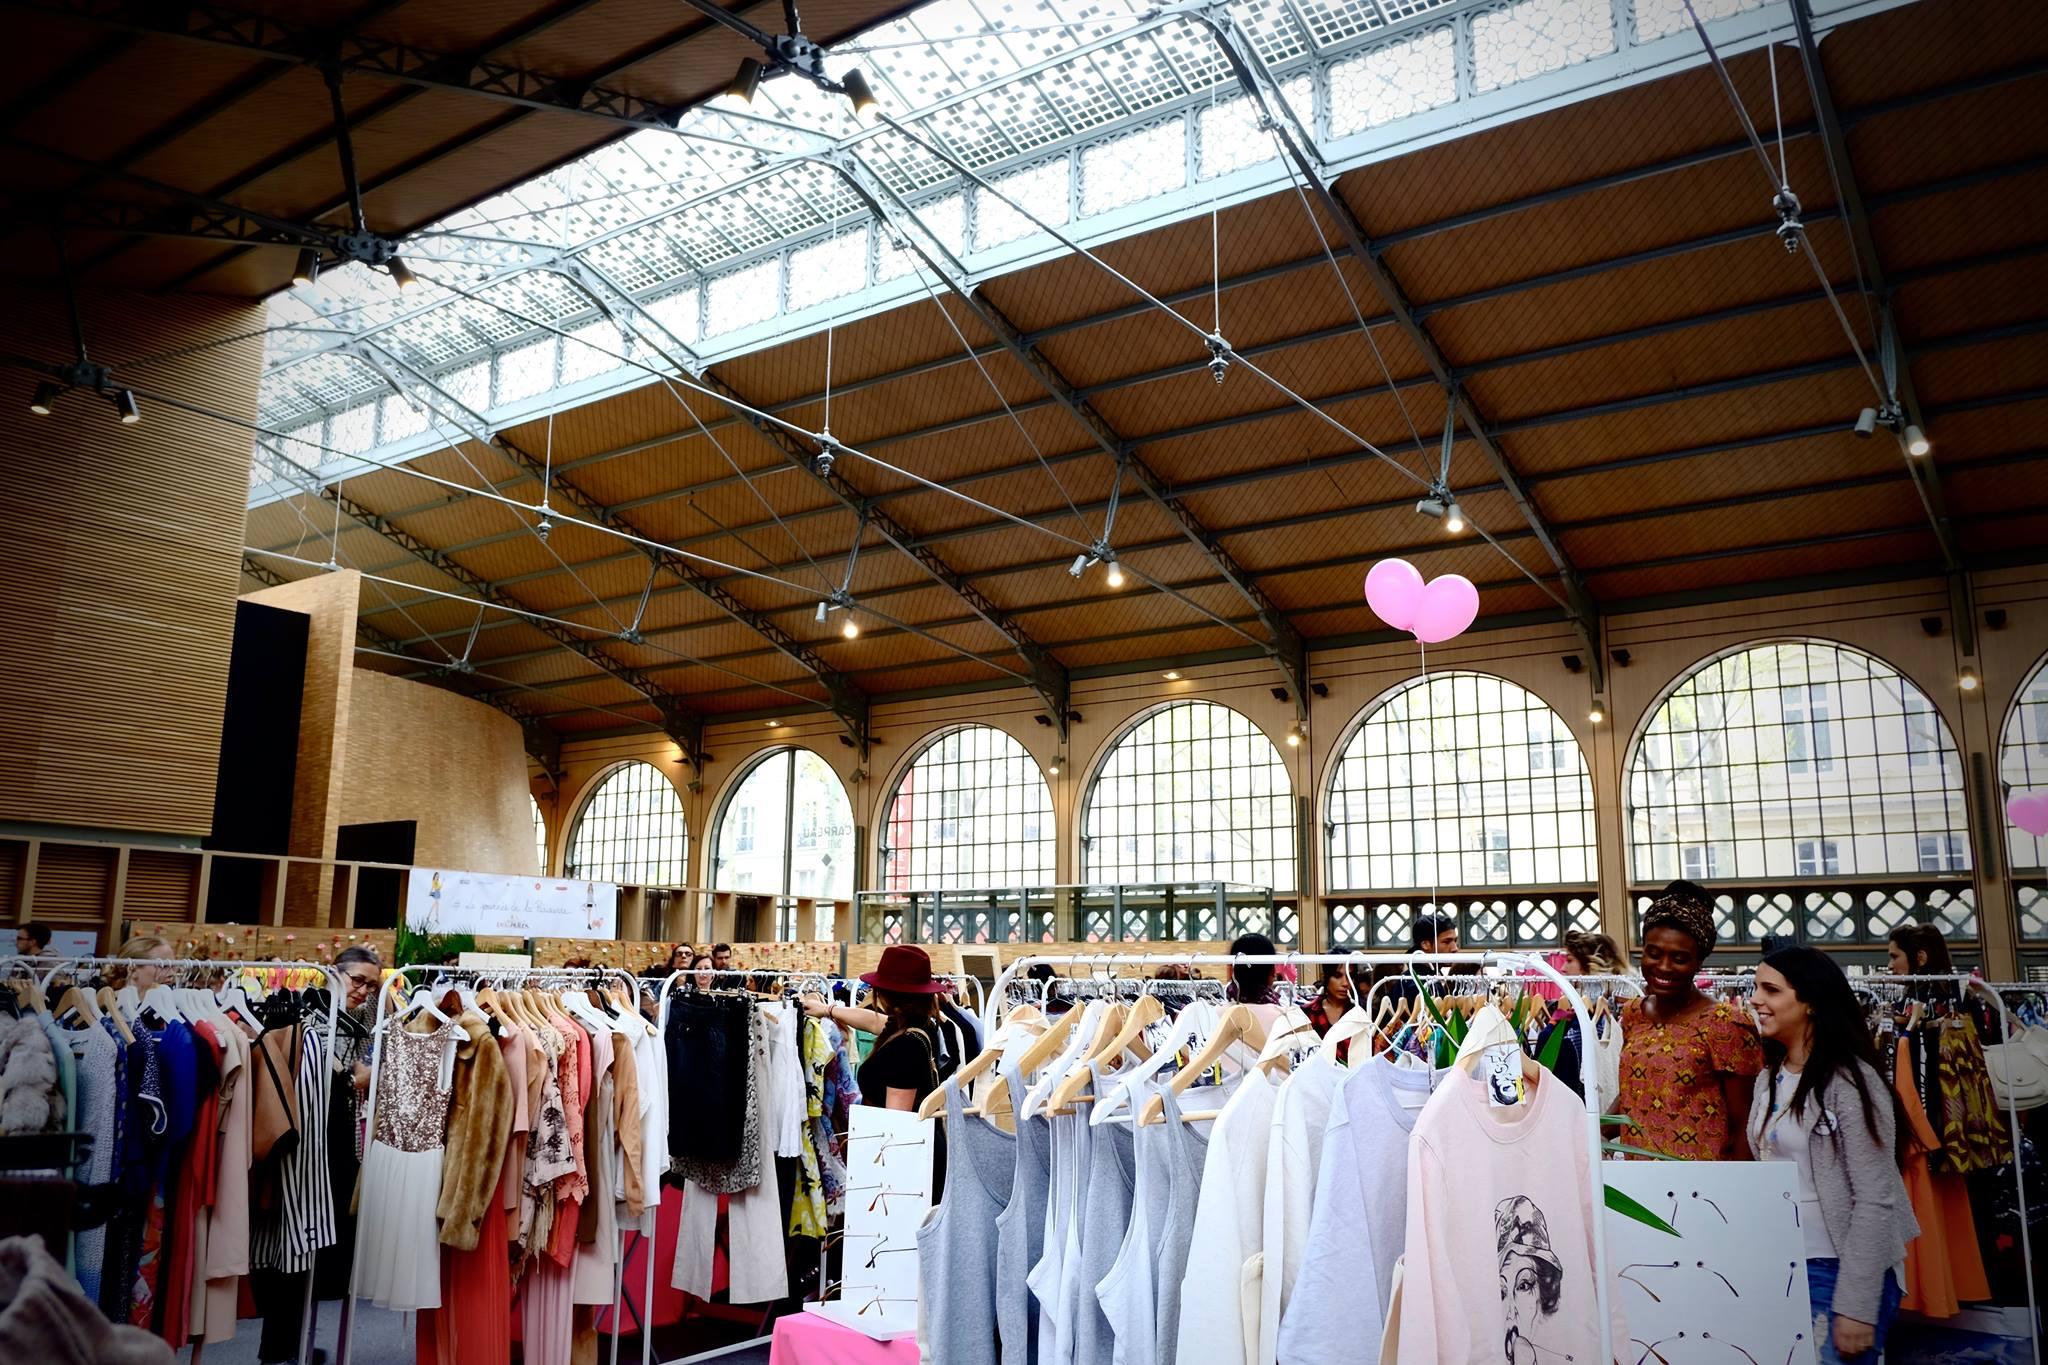 Bon-plan-Fashion-Flea-Market-Violette-Sauvage-elisa-les-bons-tuyaux.jpg